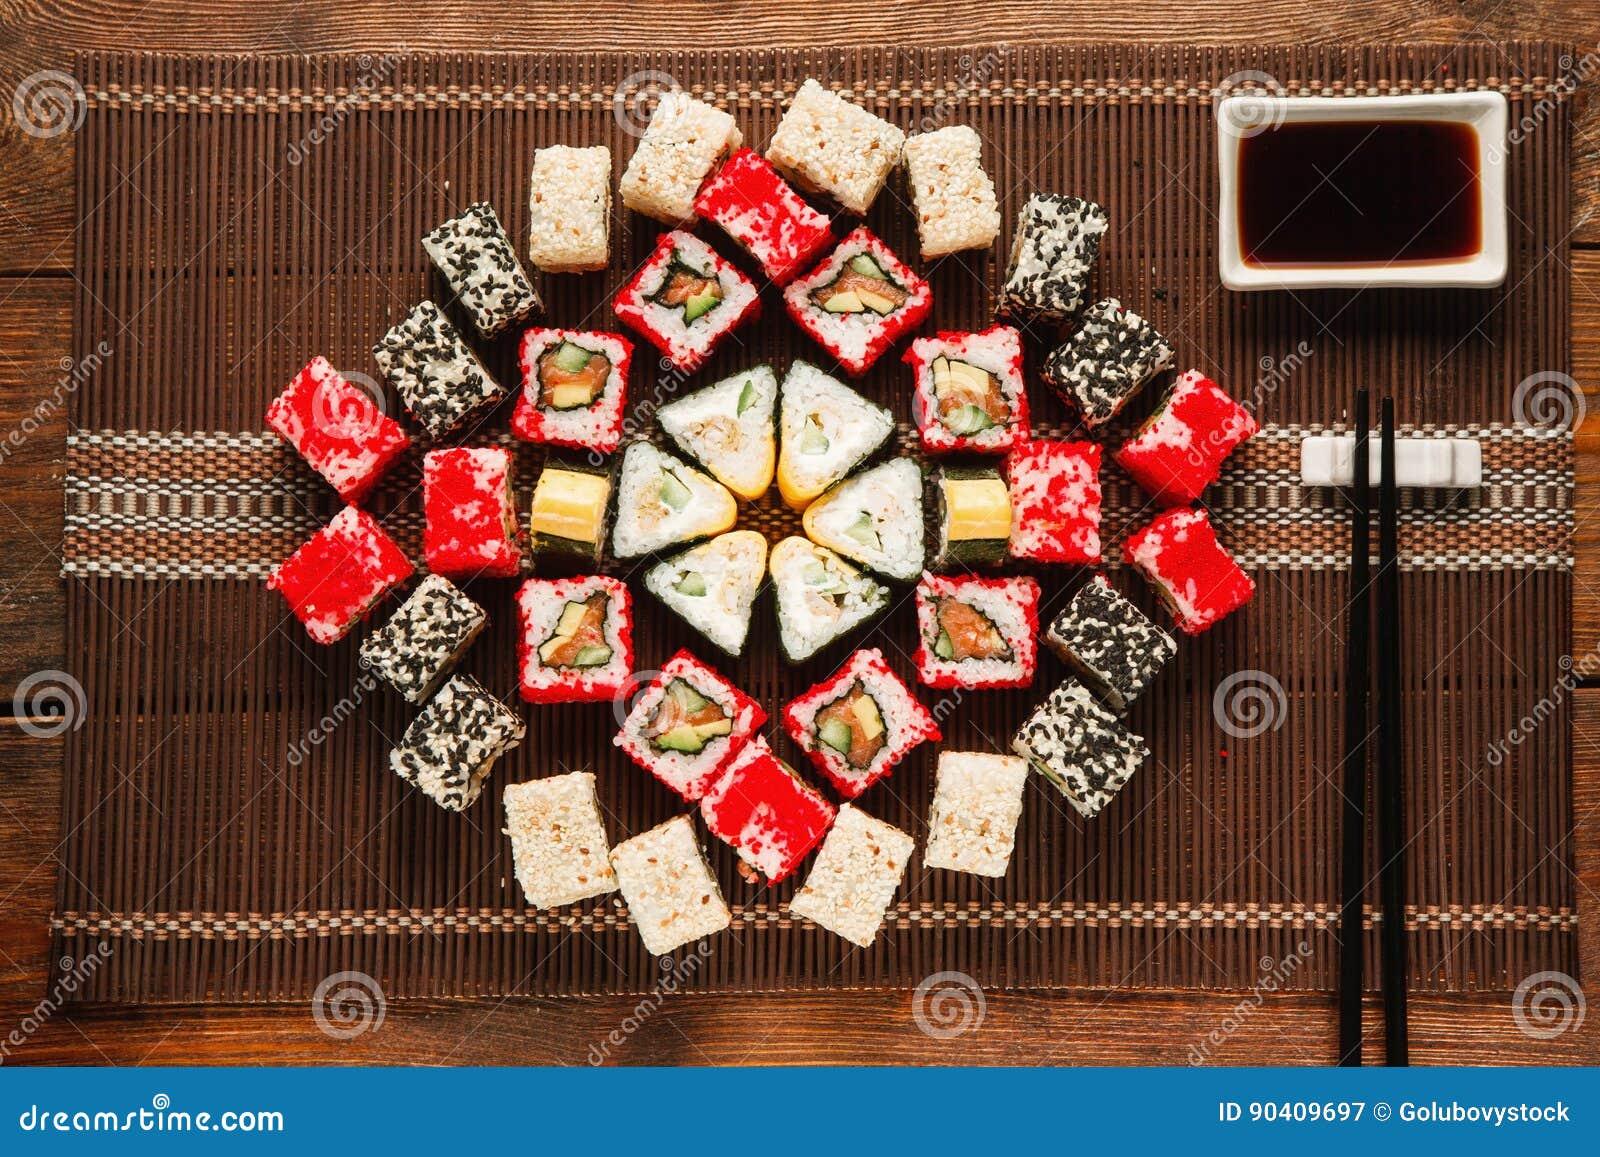 Colorful Set Of Sushi Food Art Japanese Cuisine Stock Image Image Of Rice Roll 90409697